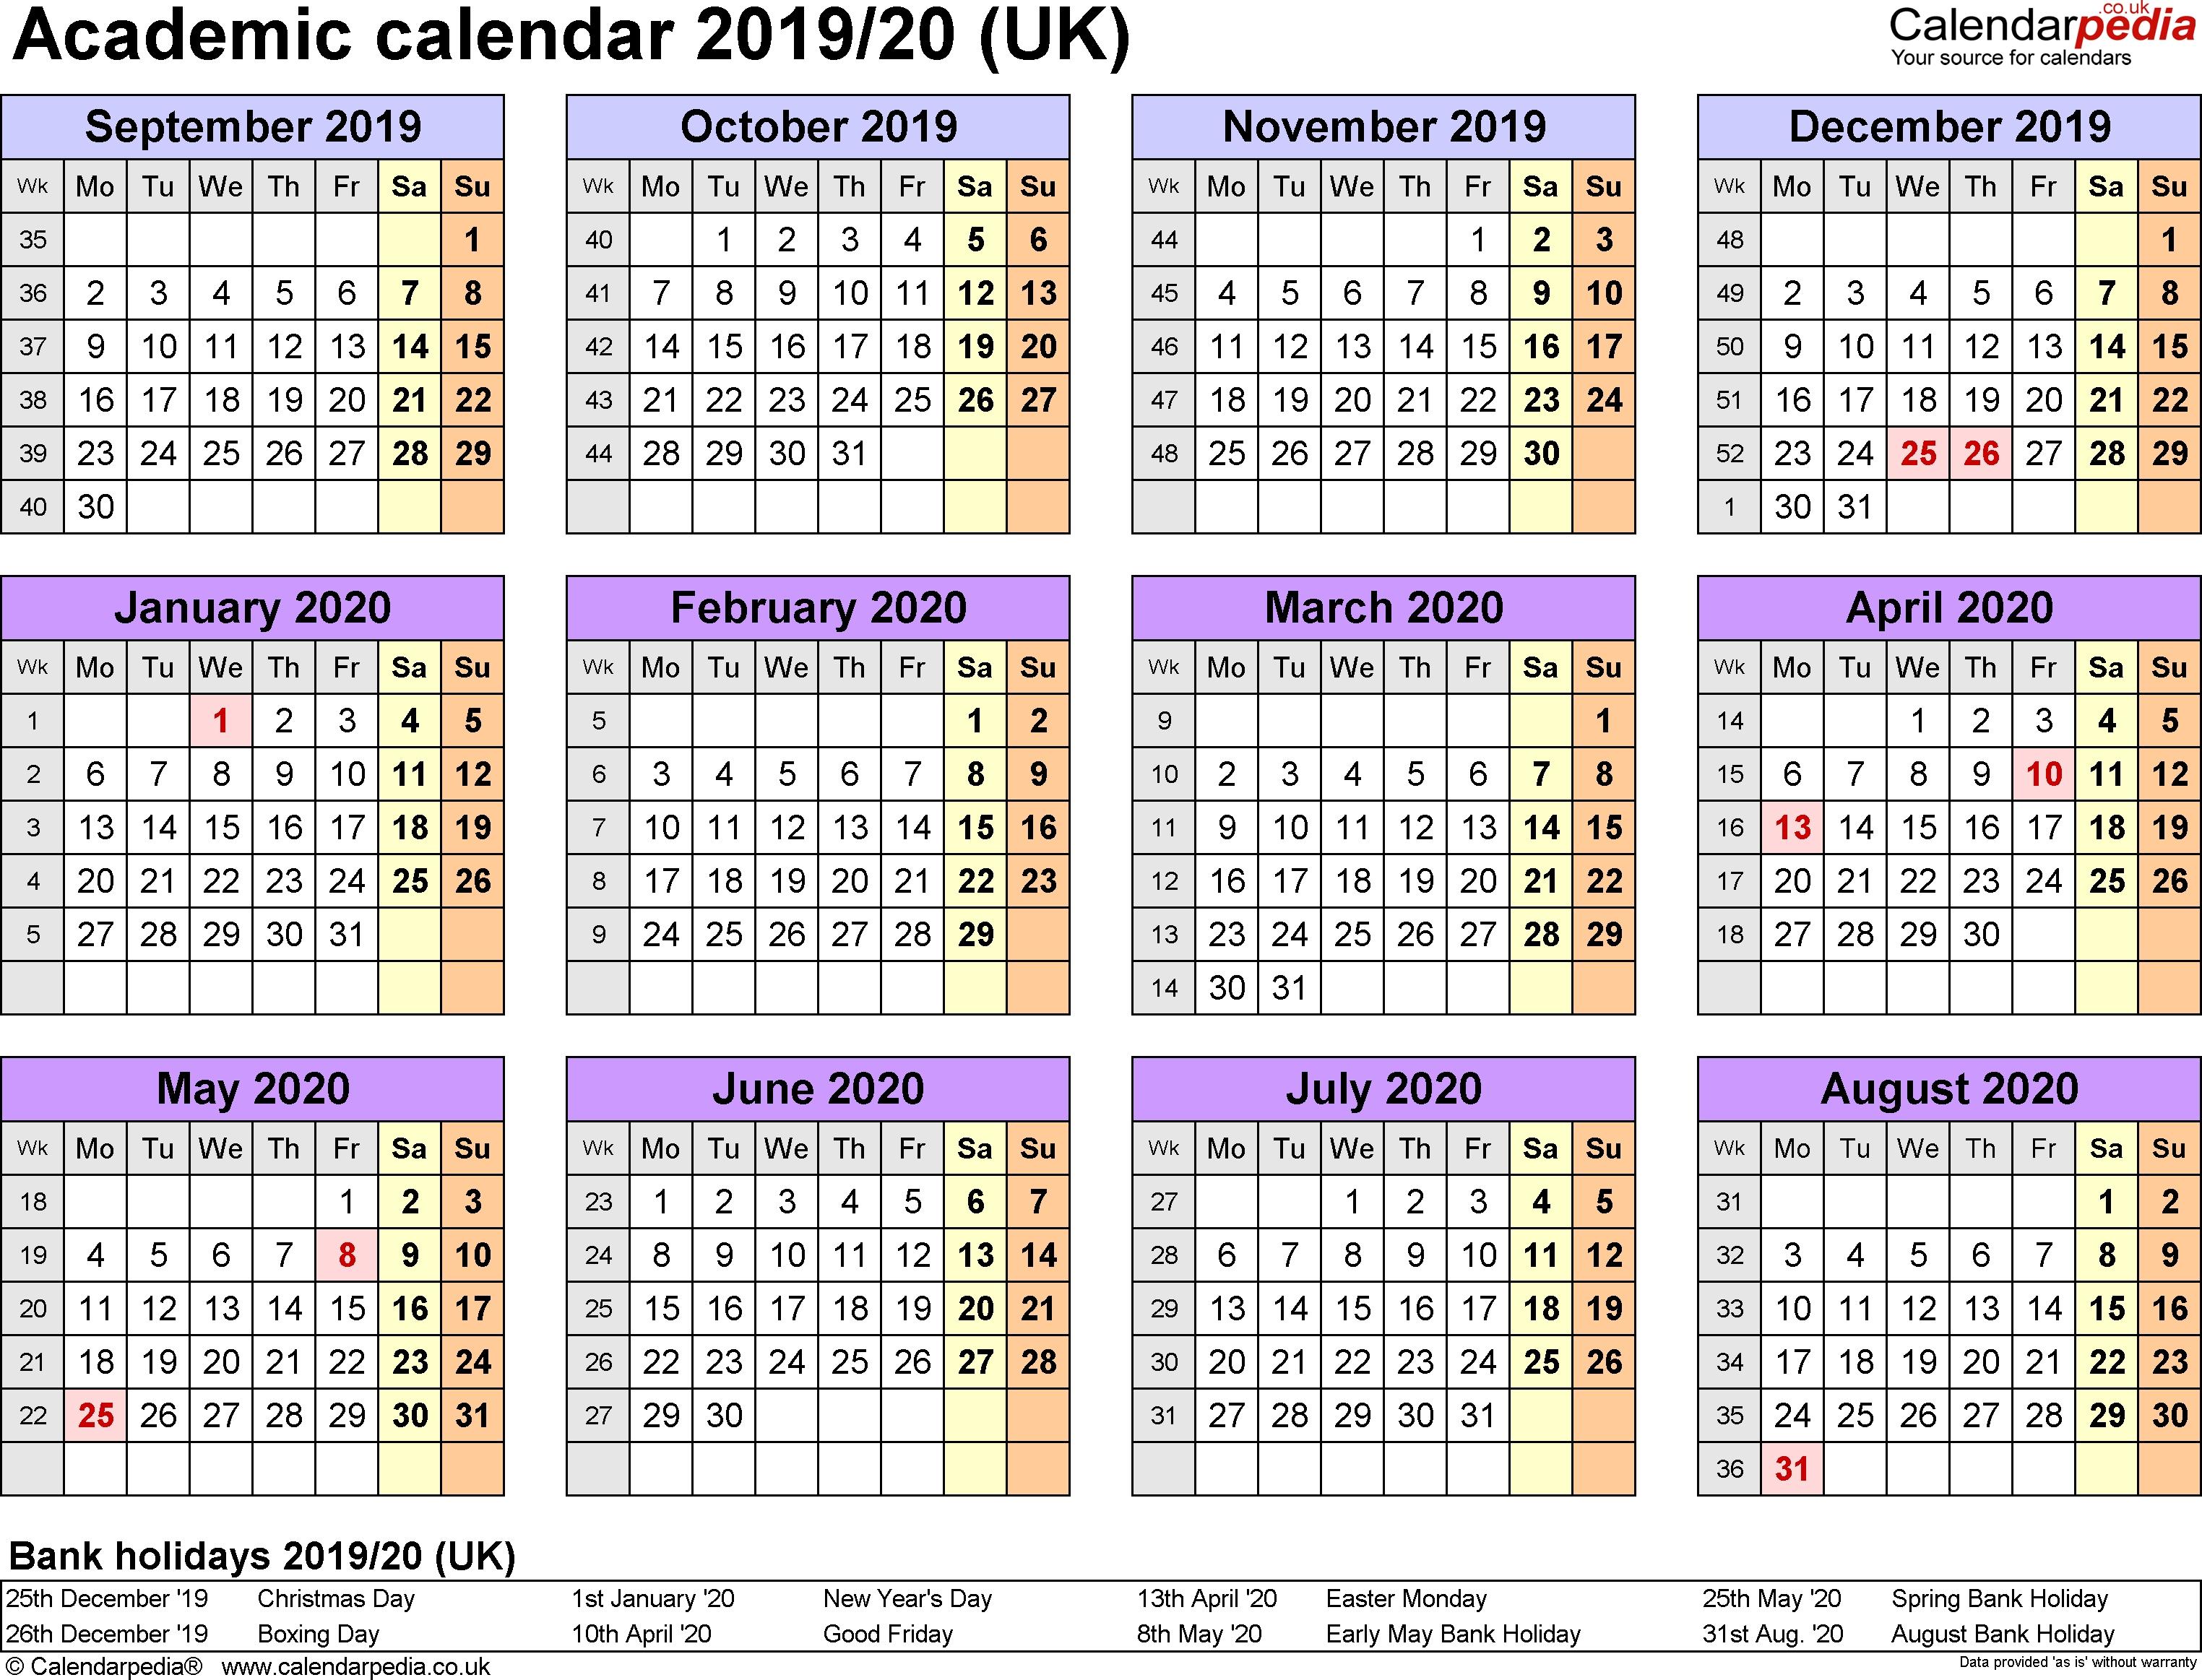 Academic Calendars 2019/2020 As Free Printable Word Templates-Calendar Labs 2020 Templates